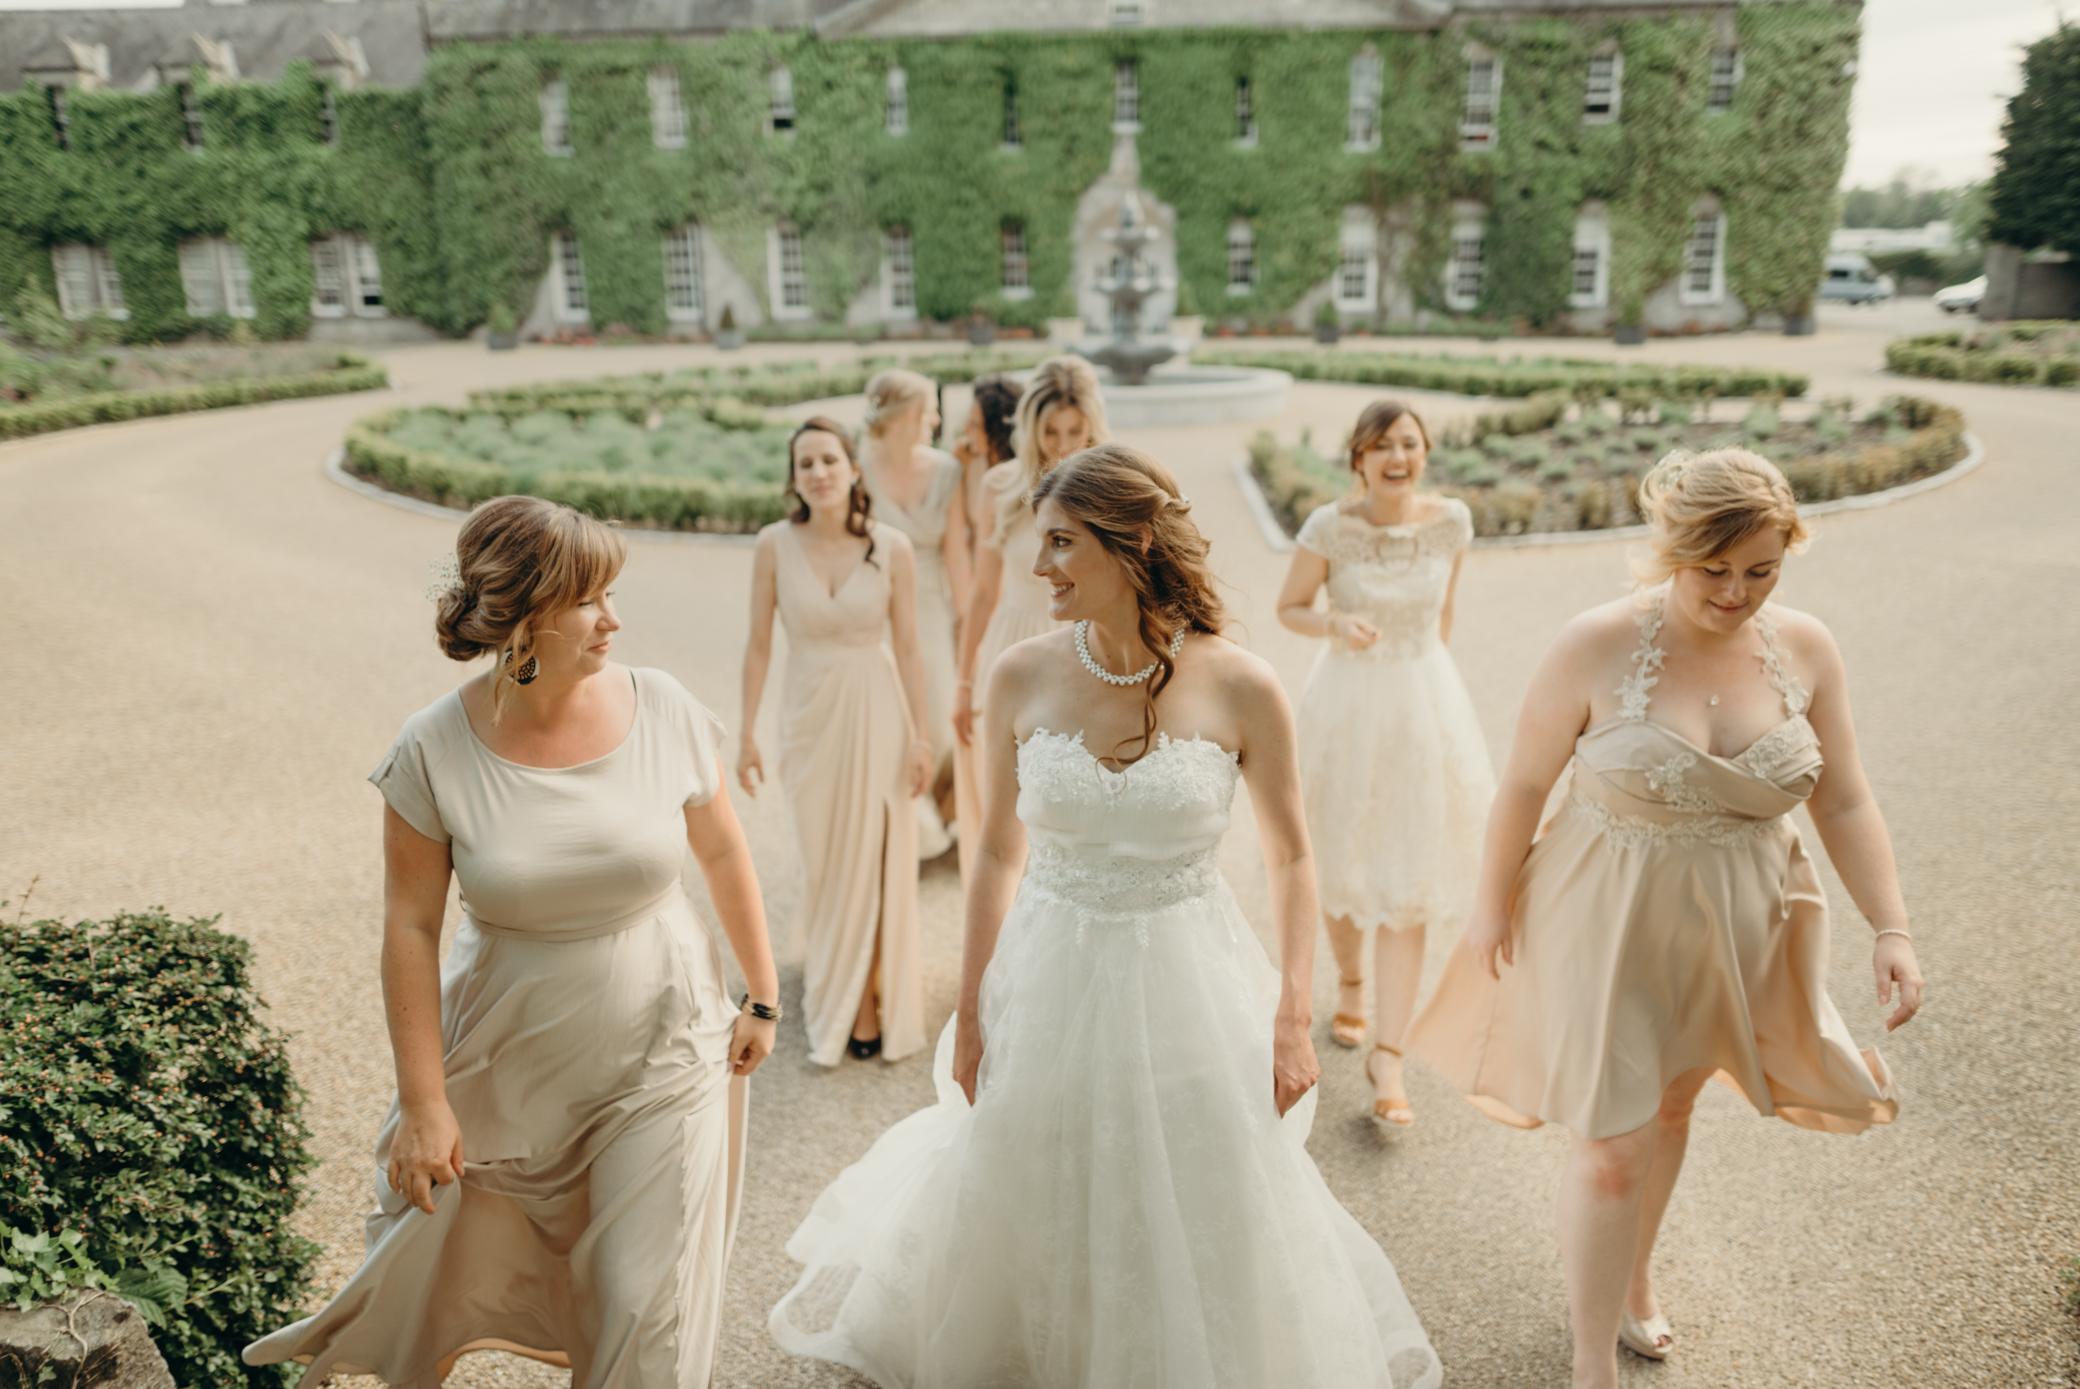 Castletown House - Celbridge Manor Hotel Wedding - Elopement Ireland-9.jpg